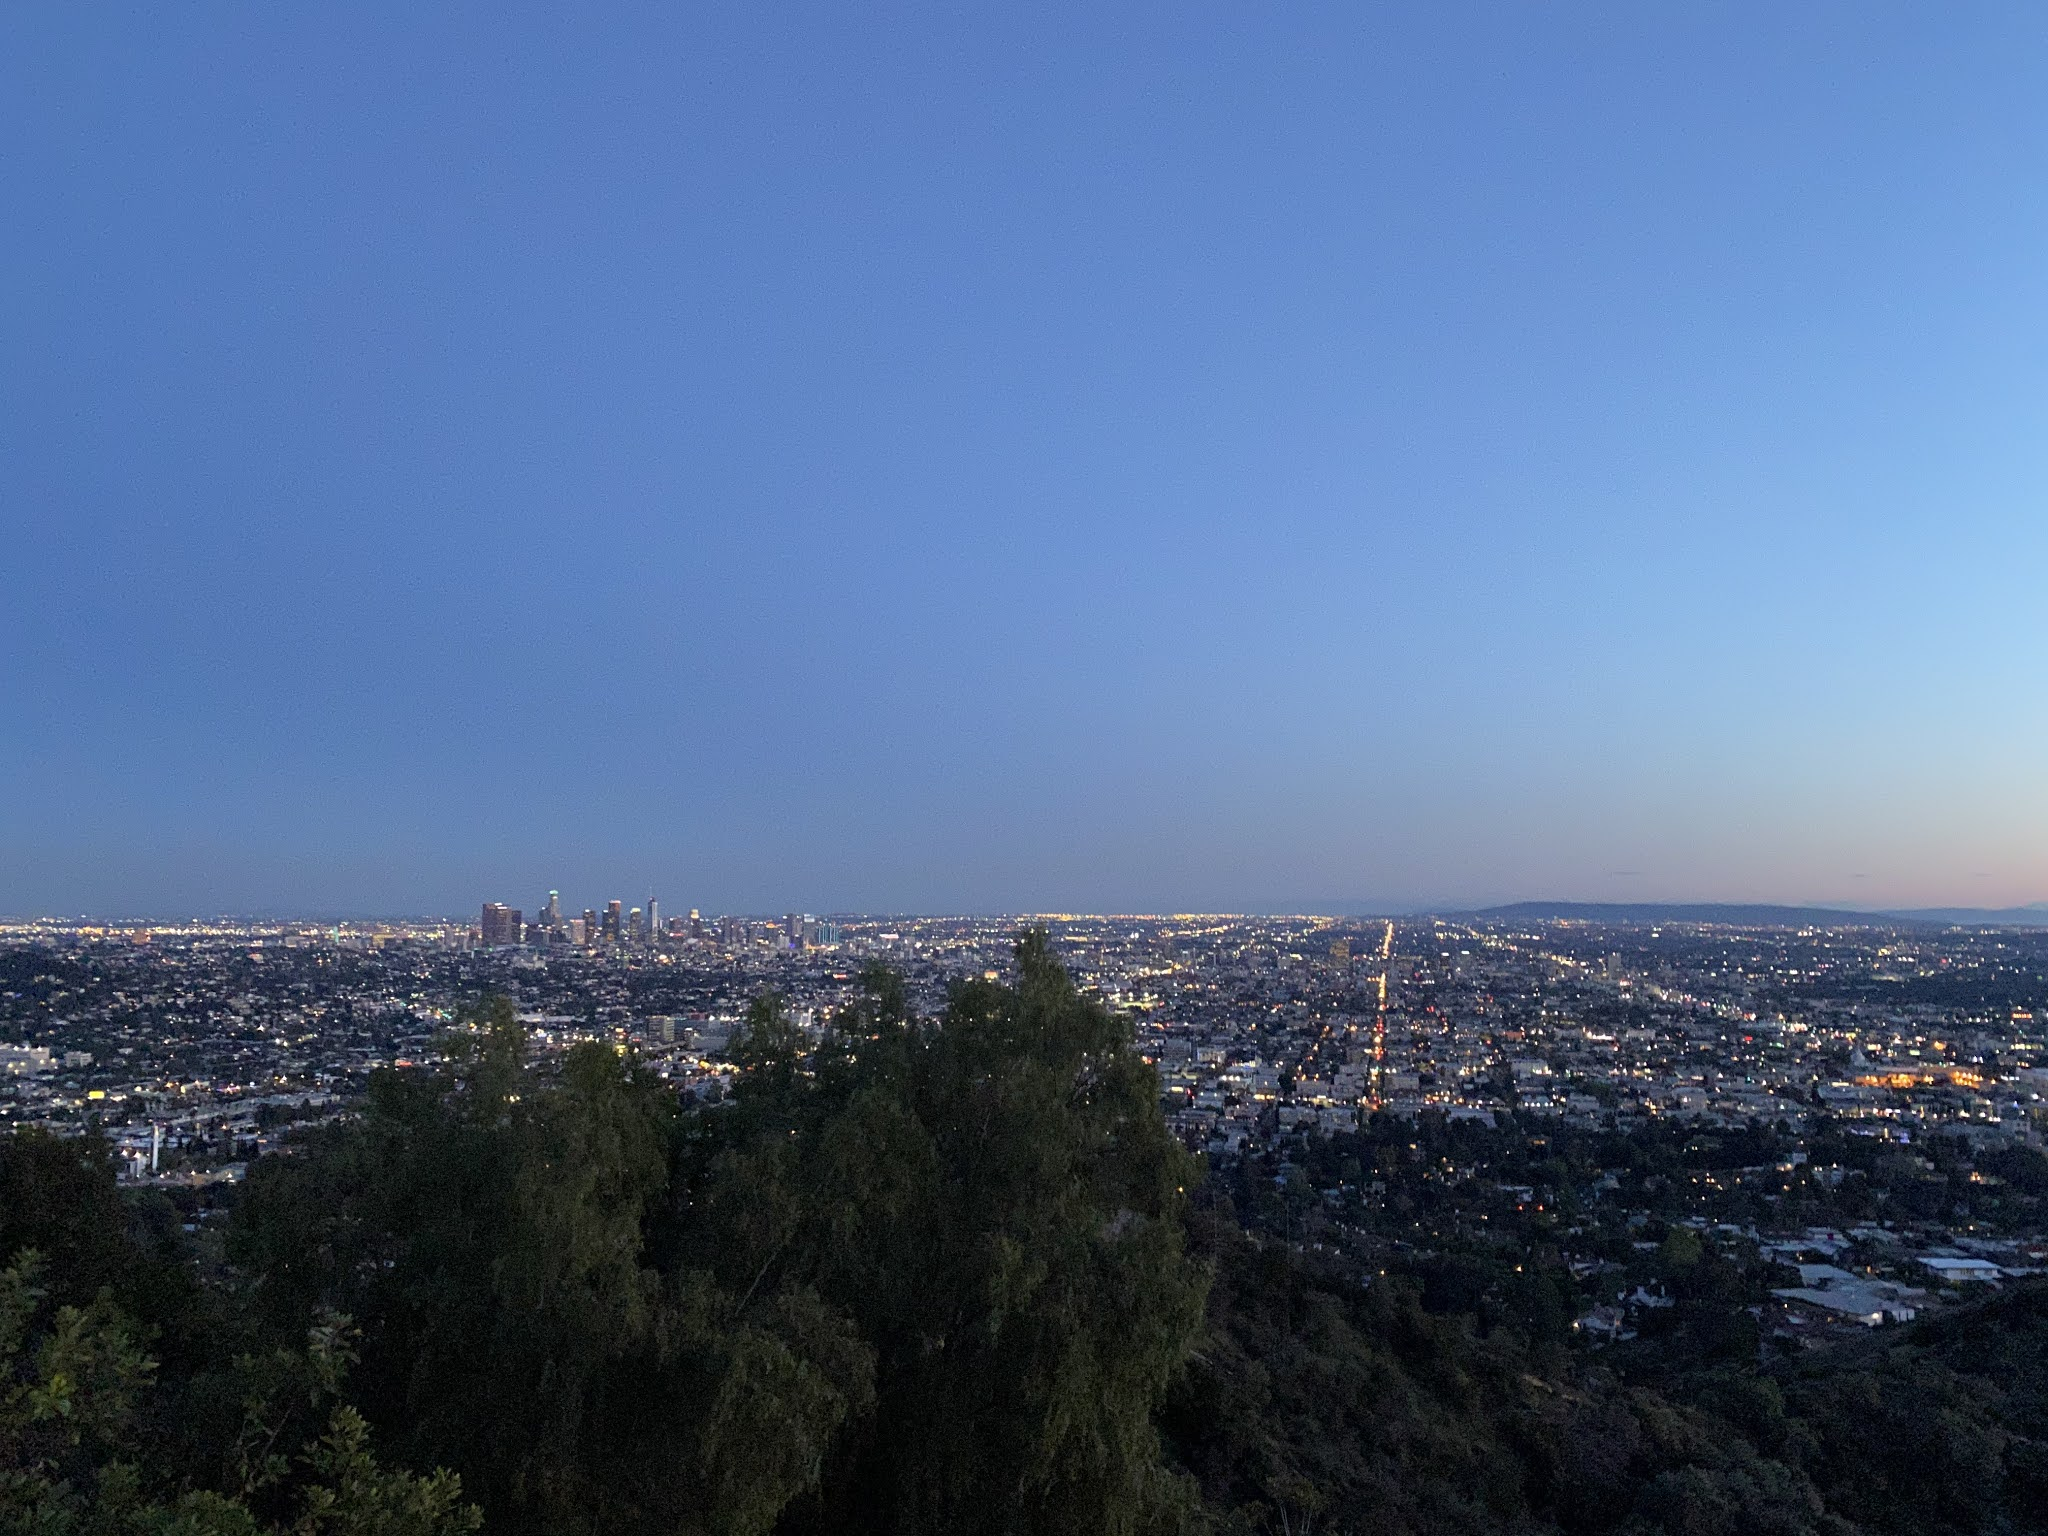 Los Angeles at Night | www.biblio-style.com